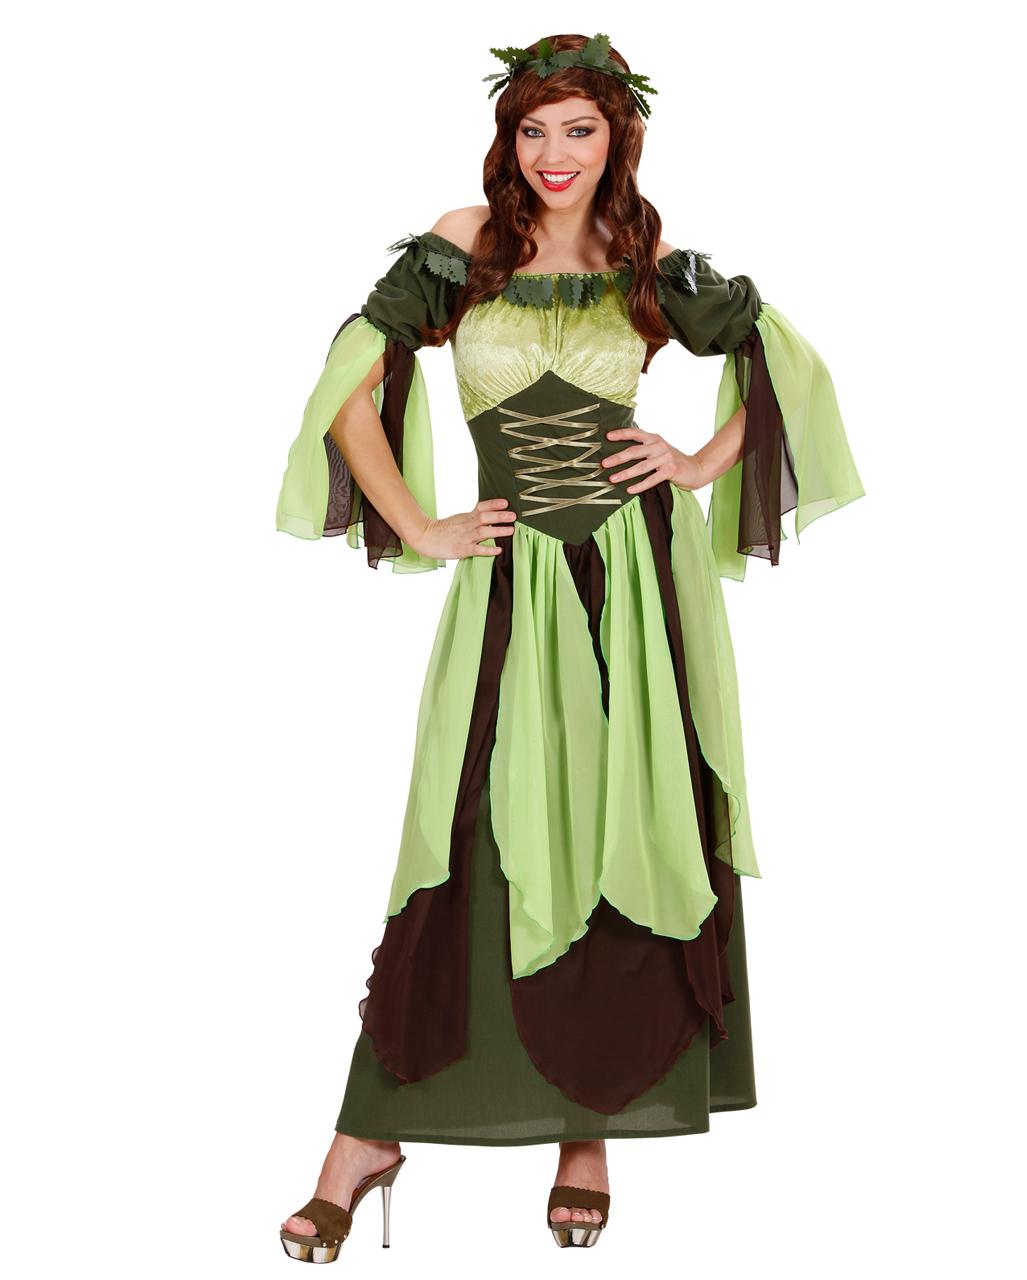 Mother Nature Costume Deluxe -Fairy Costume-Elf Costume ...